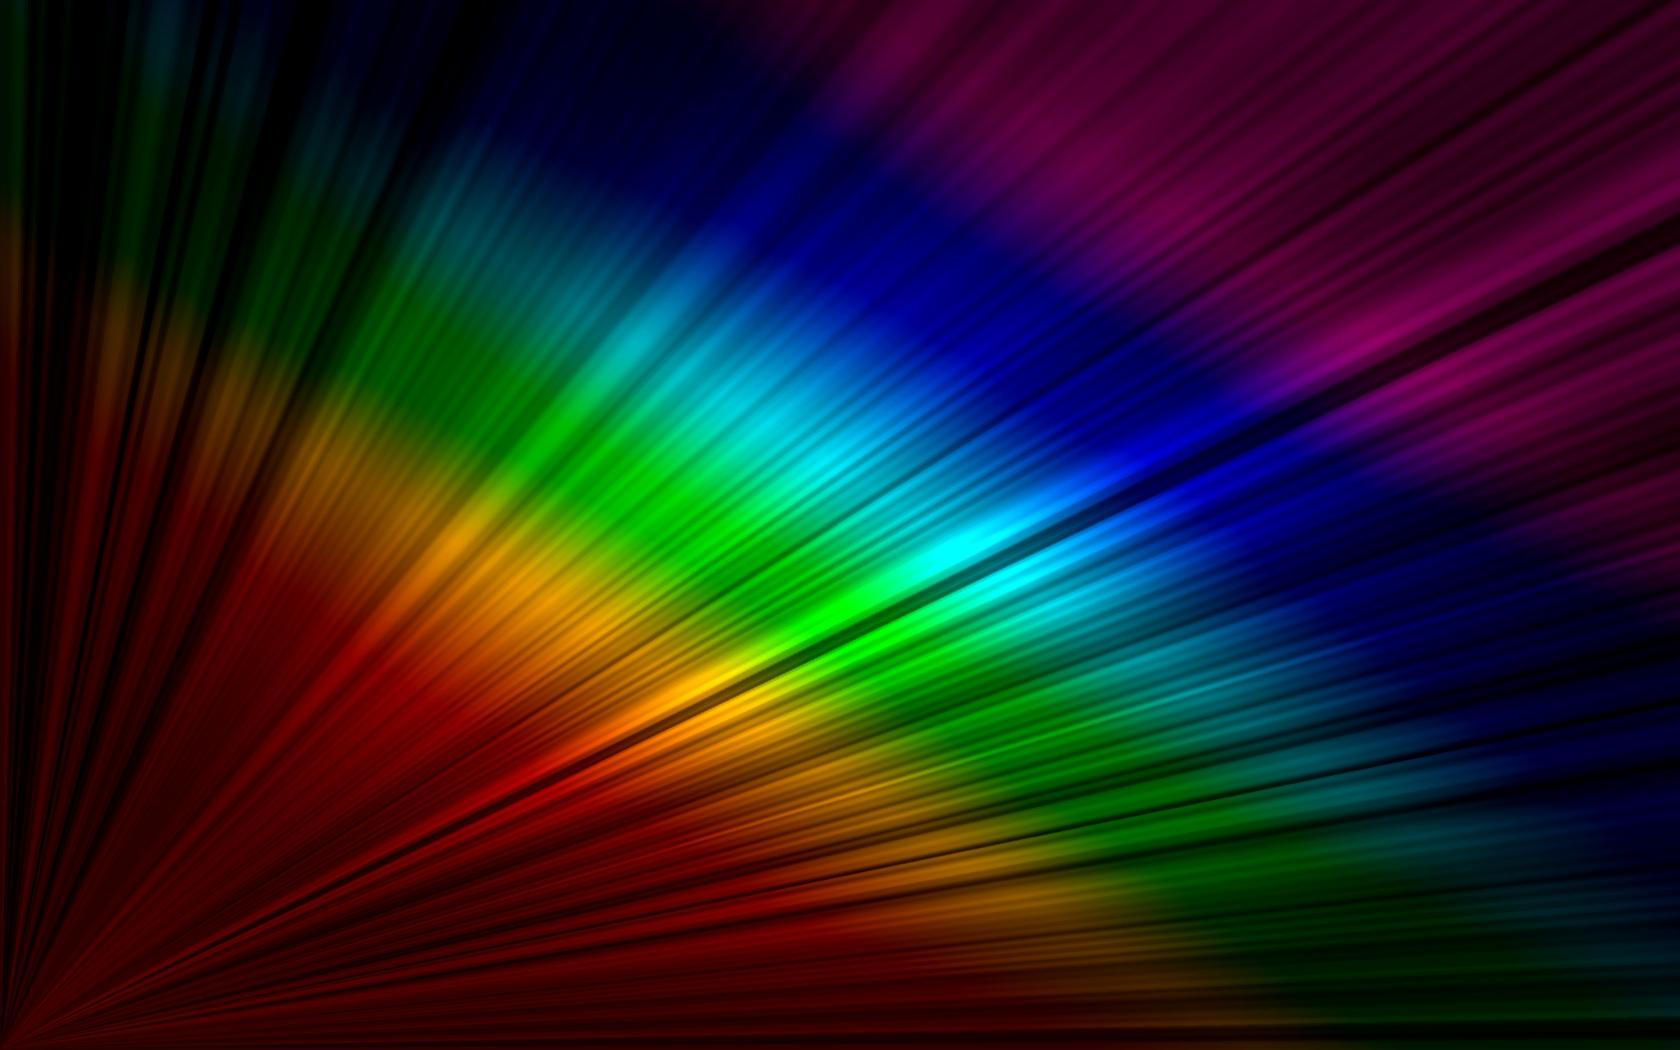 Rainbow Wallpaper Desktop: Rainbow On The Desktop